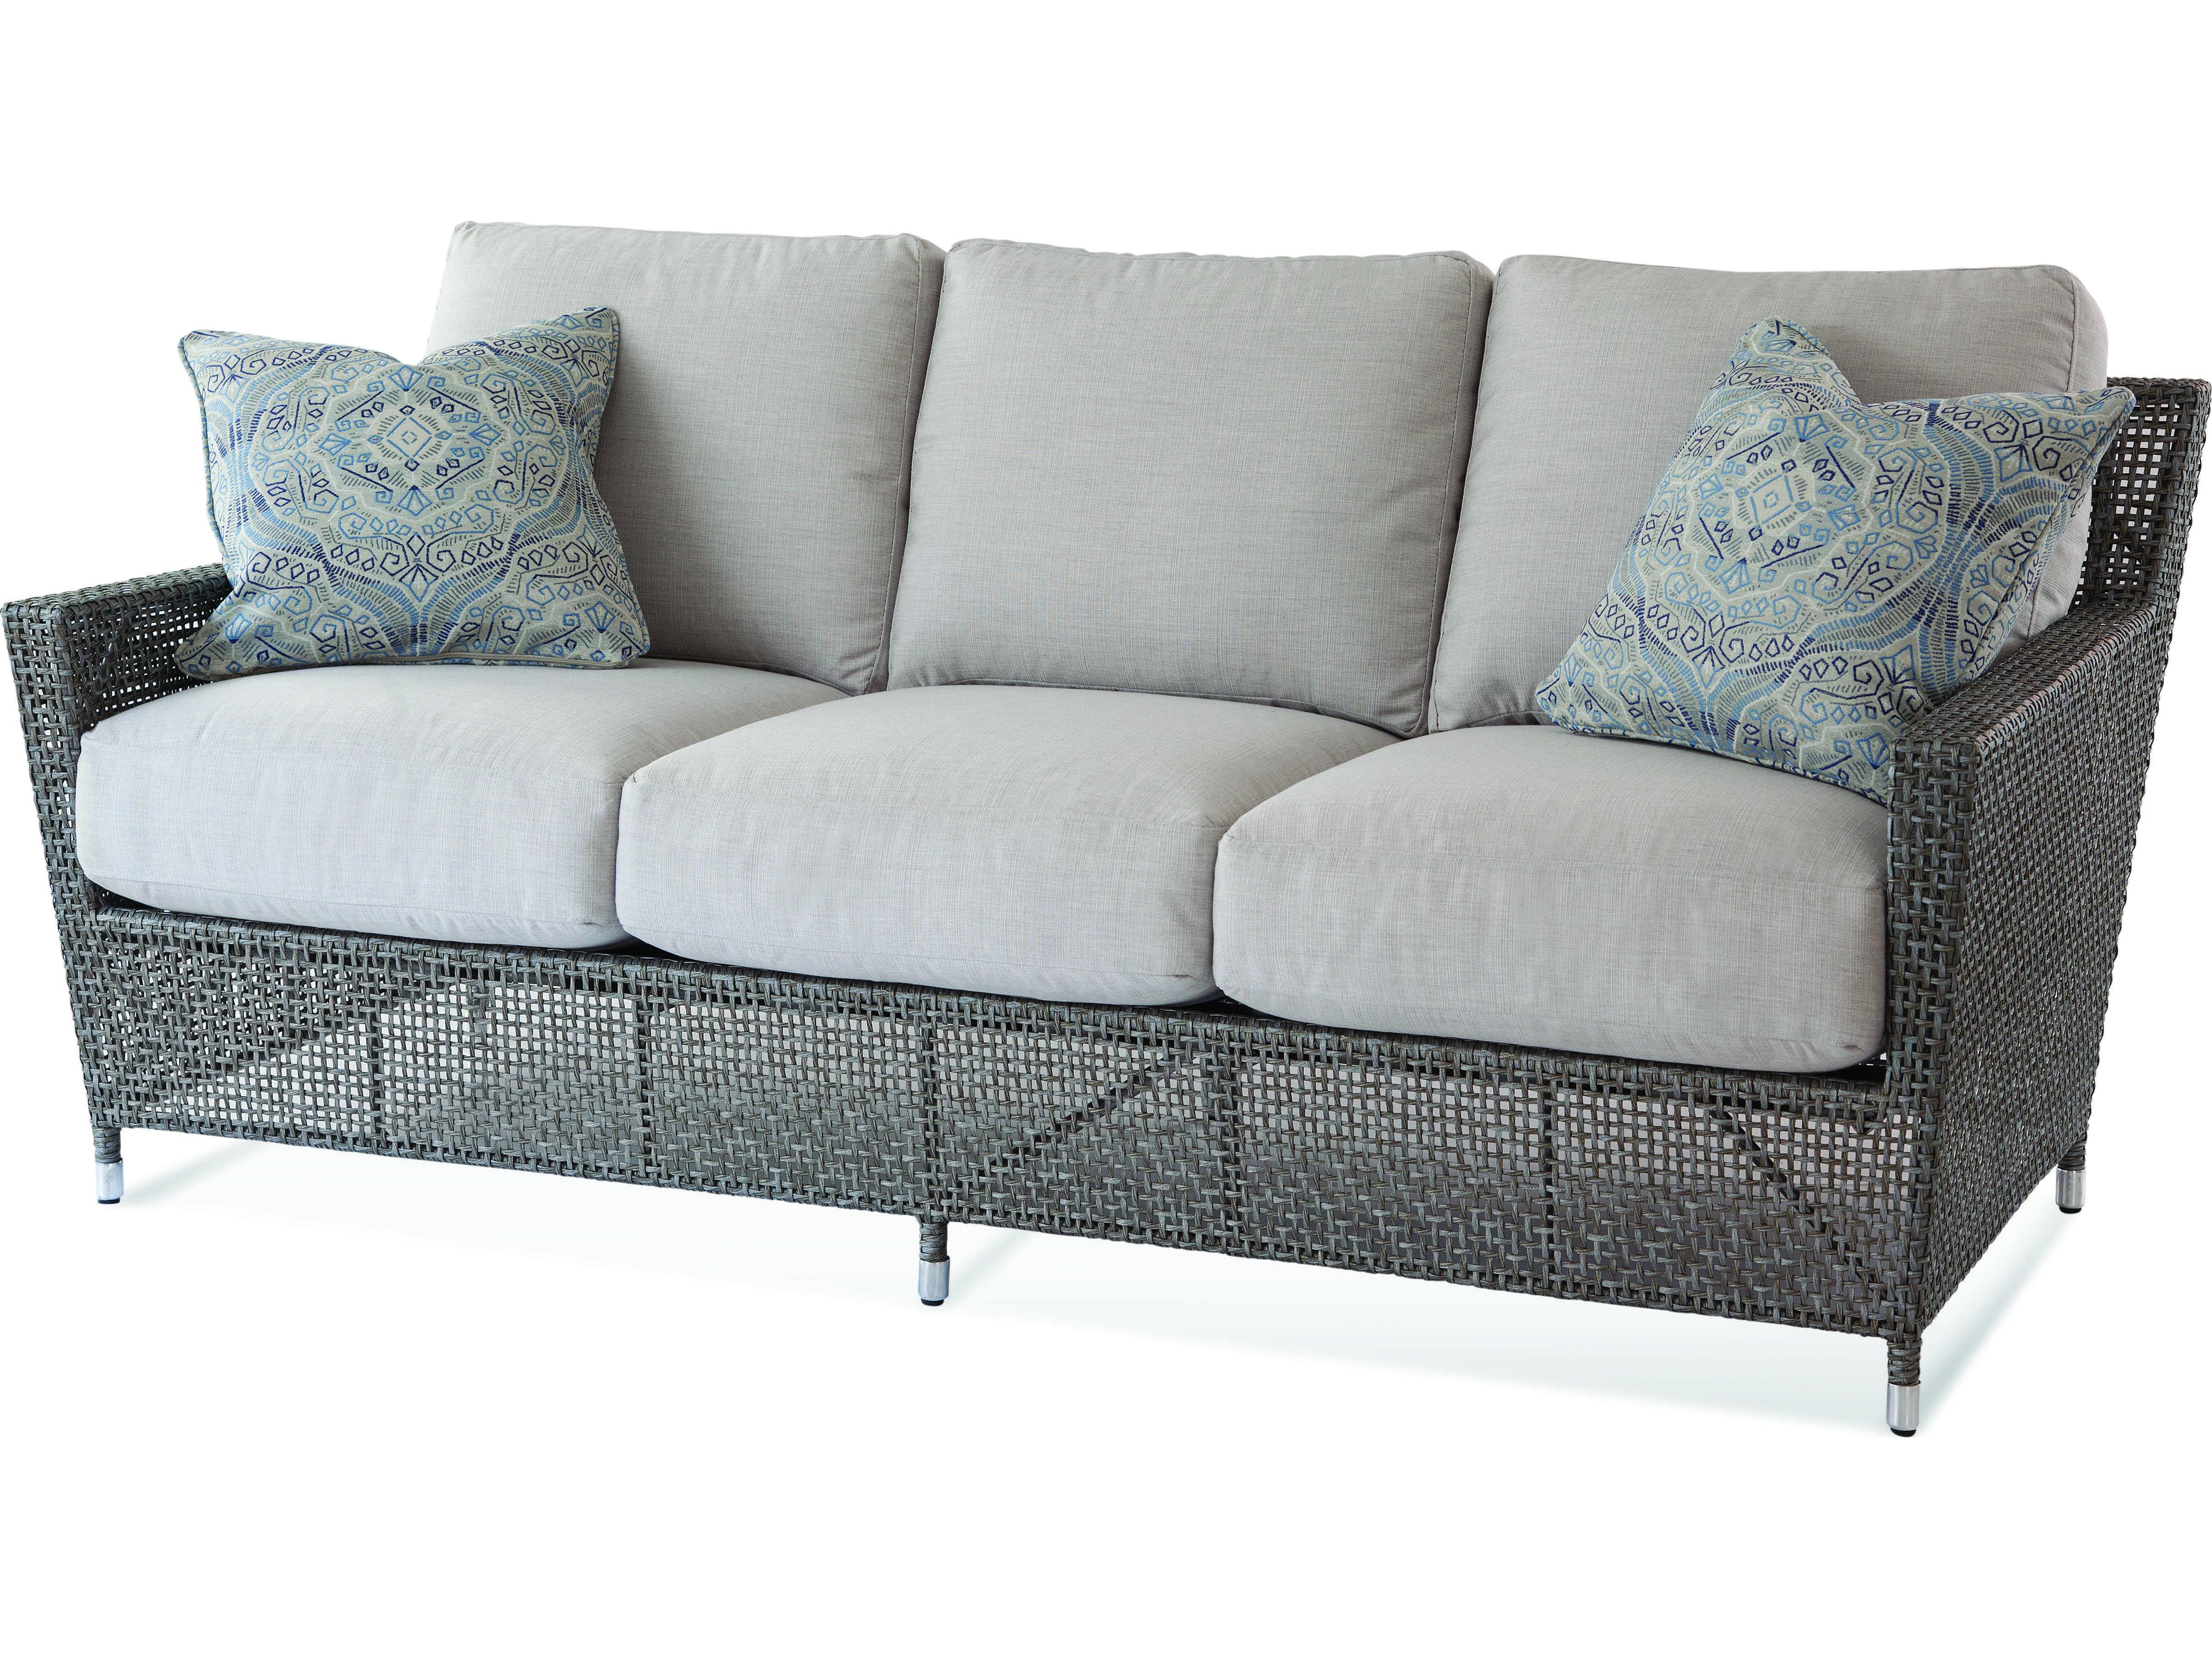 Brunswick Teak Loveseats With Cushions Pertaining To Popular Braxton Culler Edisto Pewter Loveseat Sofa (Gallery 17 of 20)